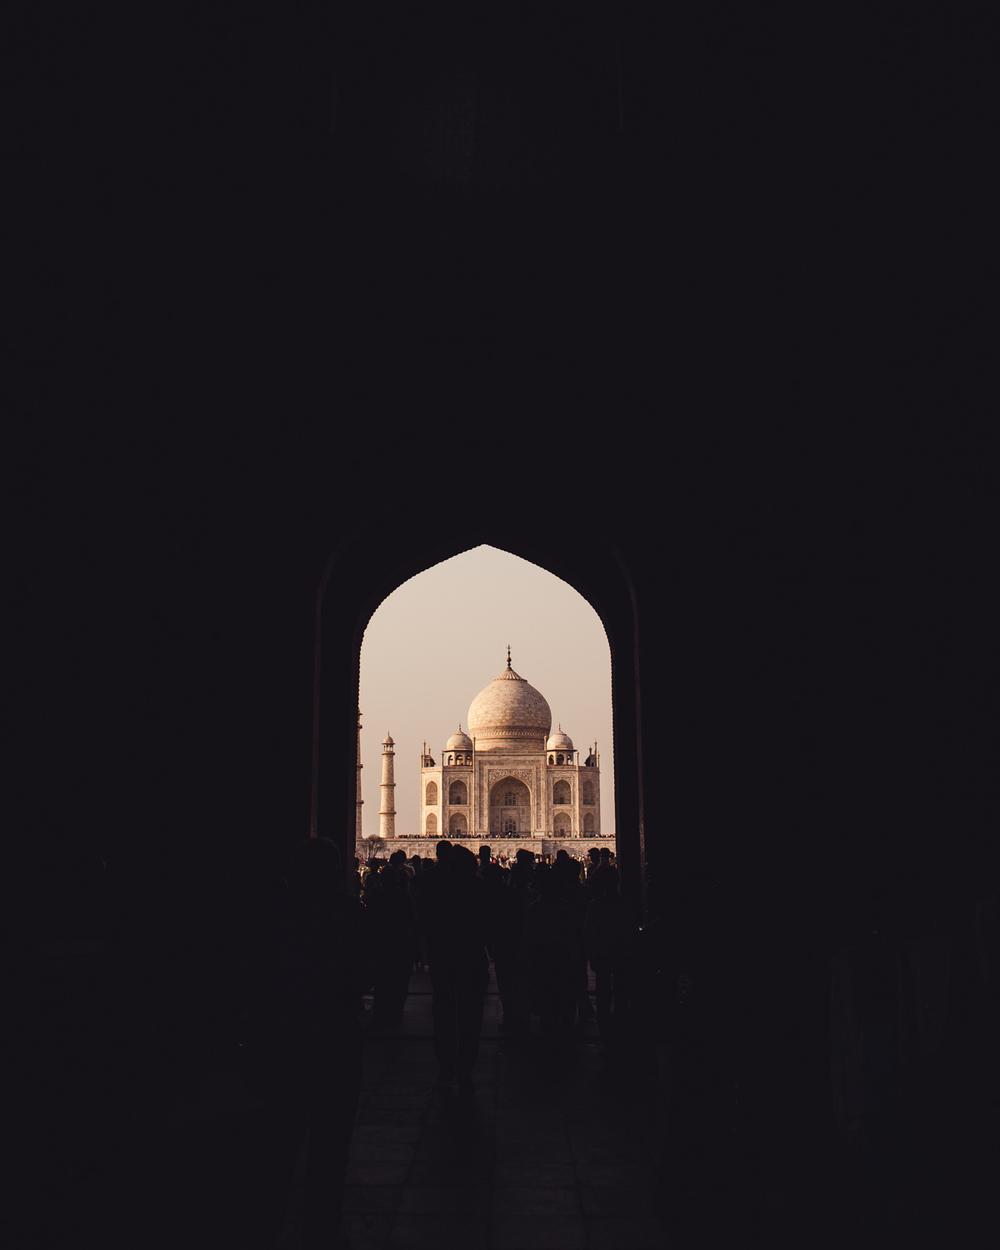 india_travel_photography-25.jpg